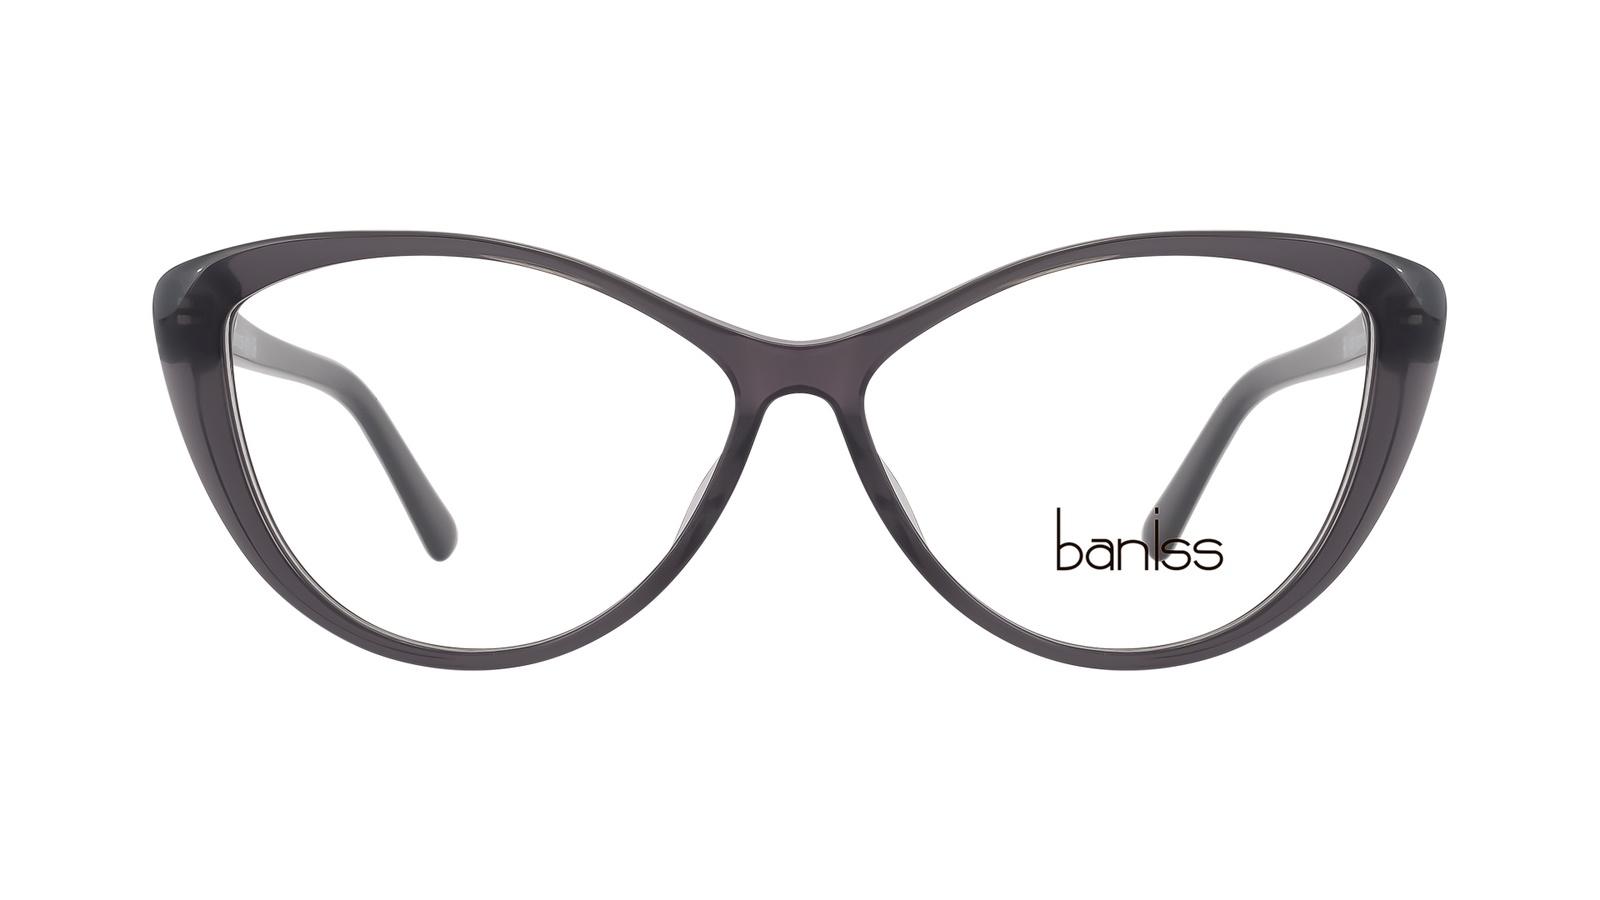 Оправа для очков, BANISS, пластик, BS7019 C03